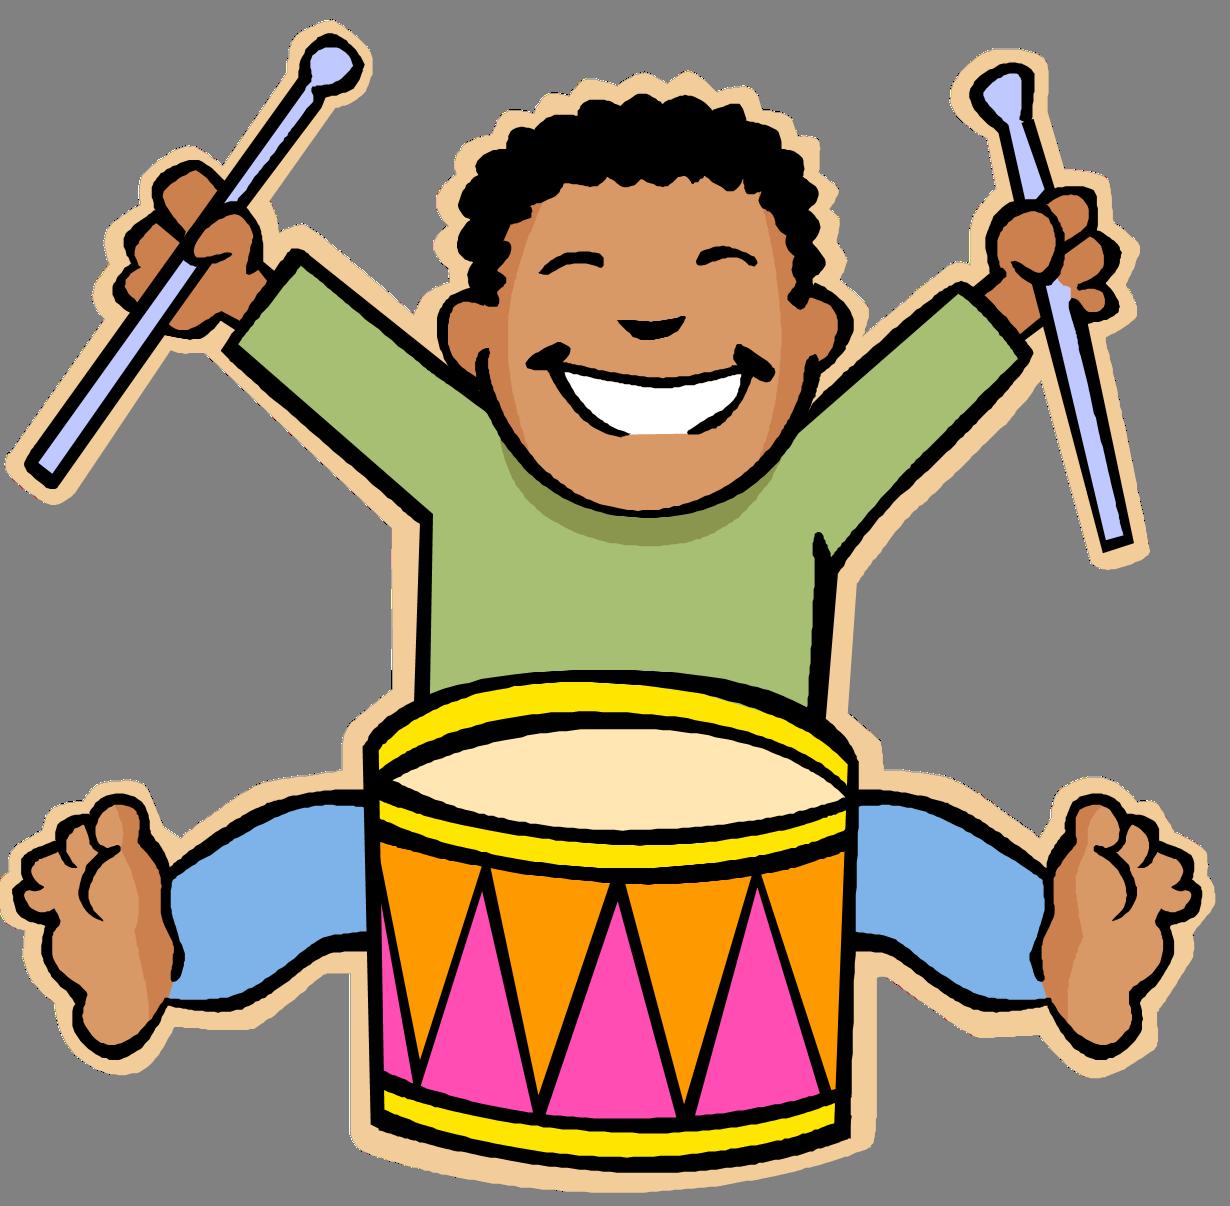 Kids and music . Musician clipart children's